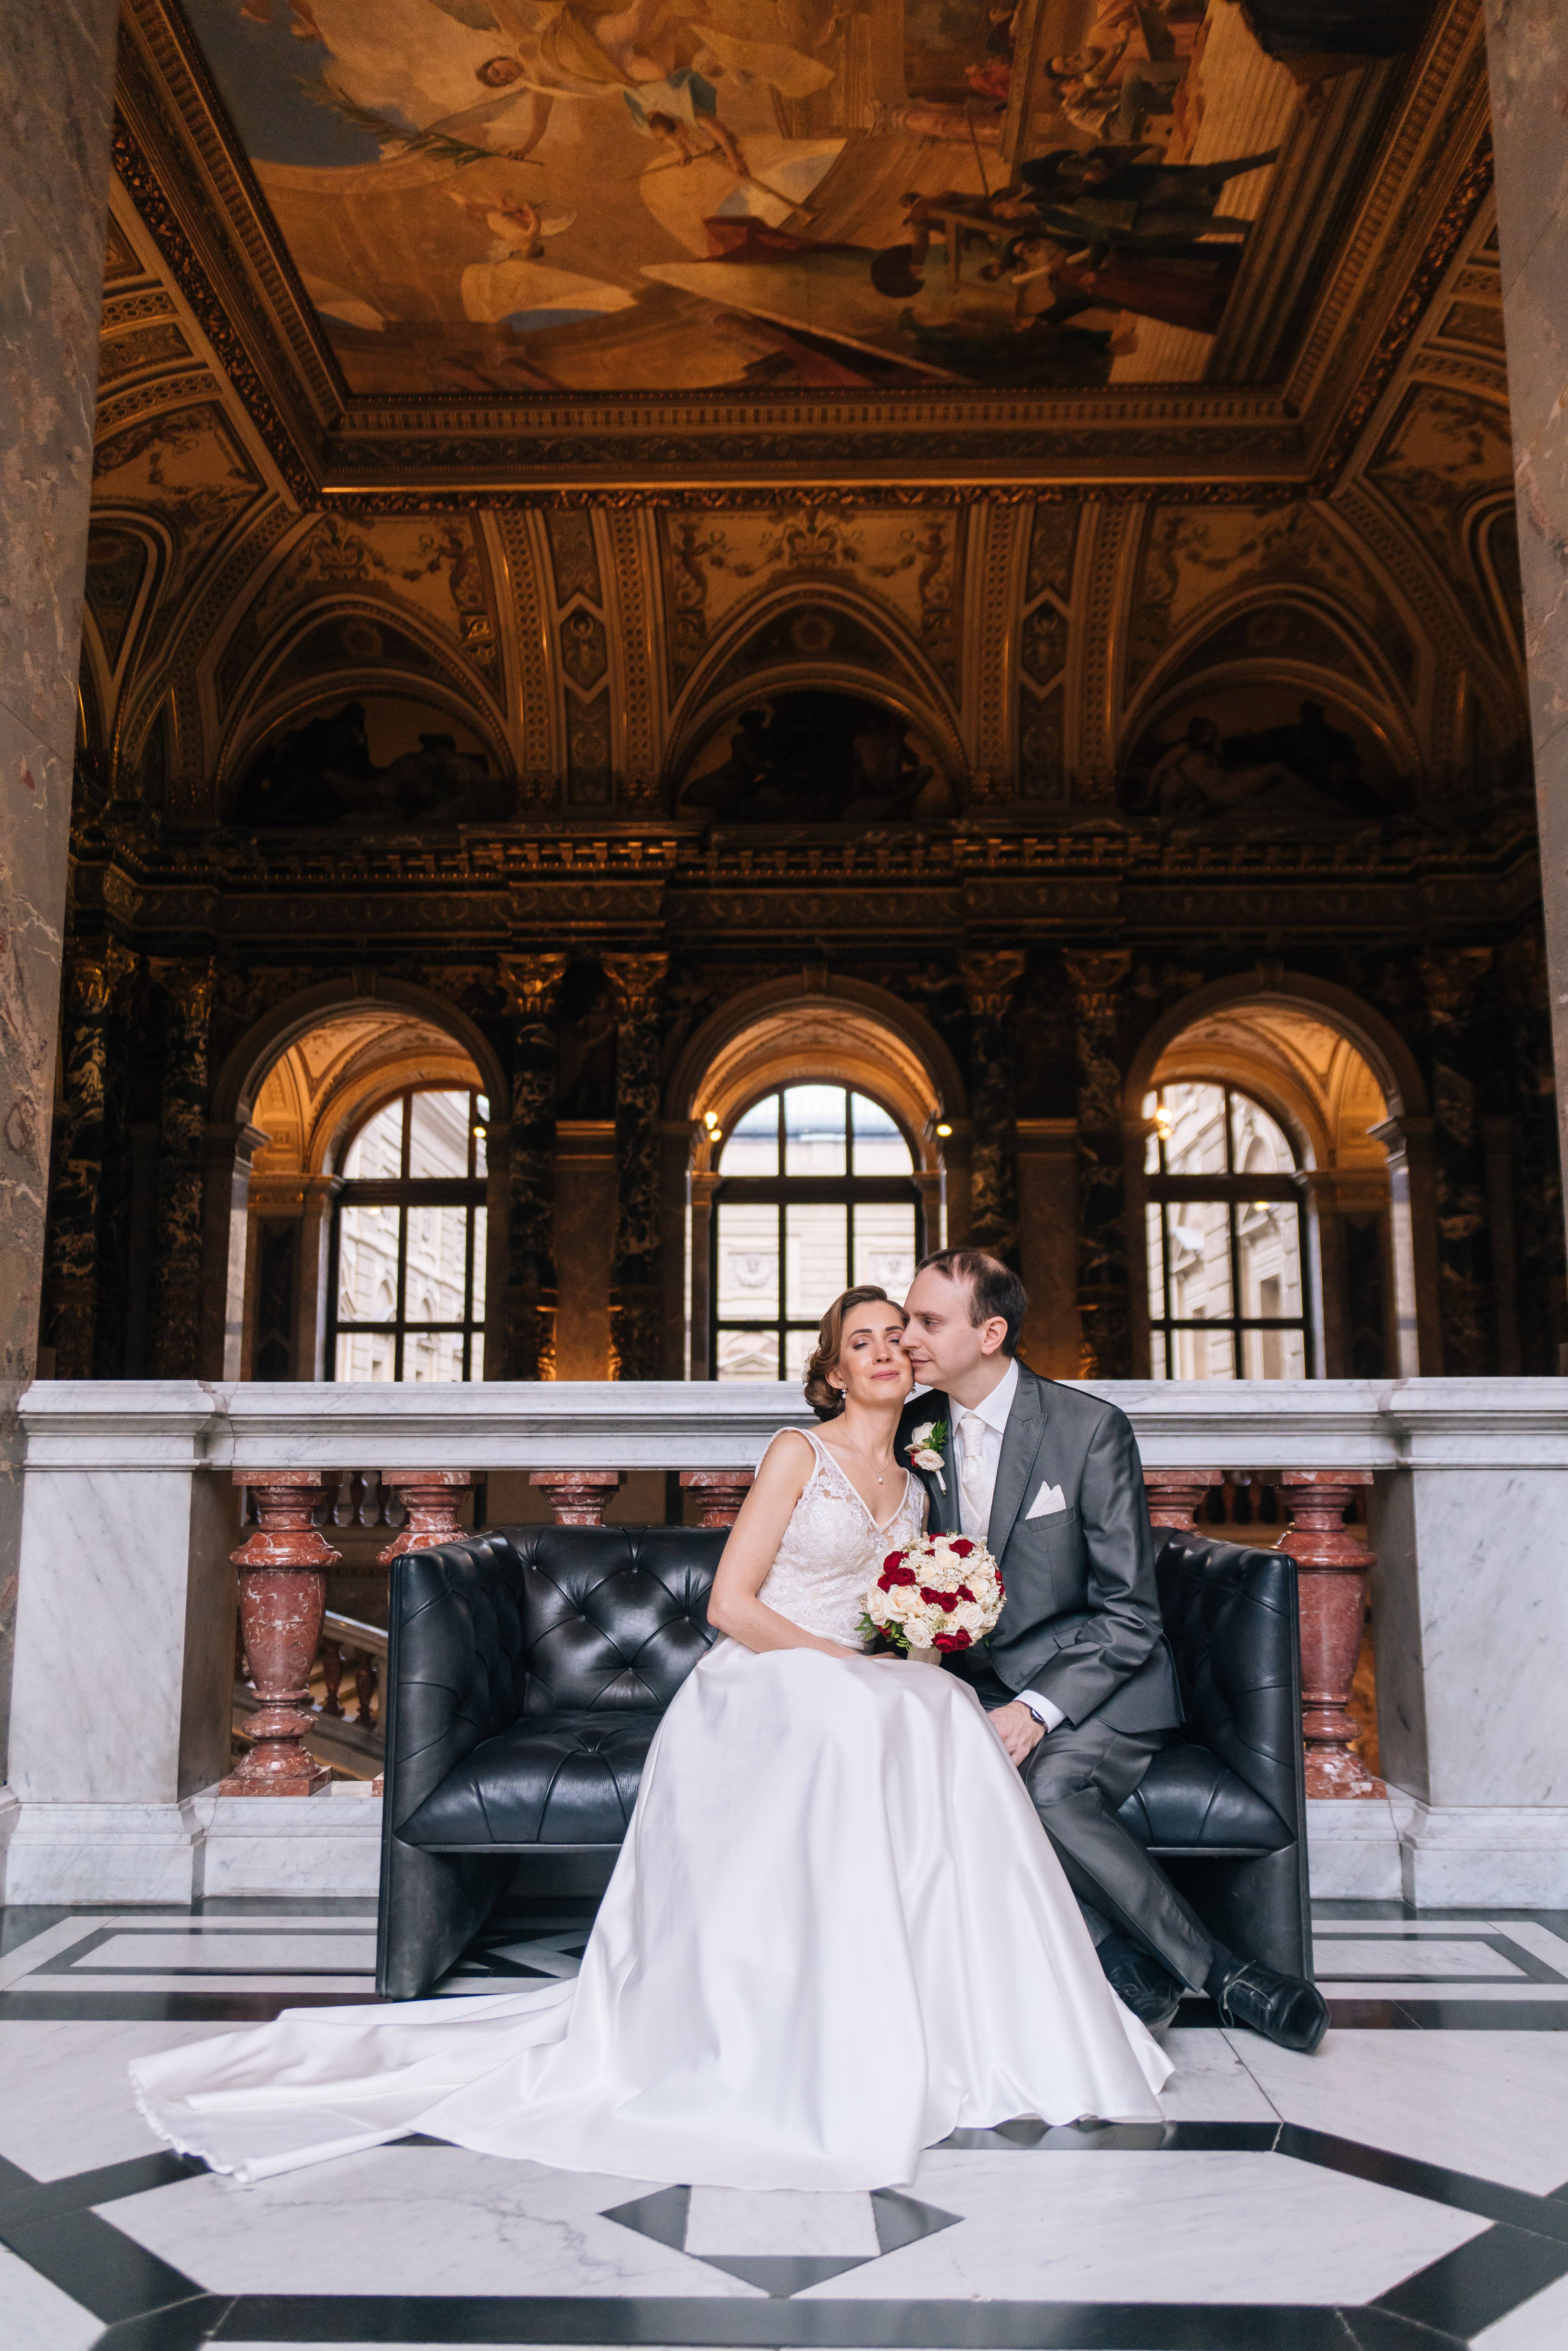 Vienna dating 2020